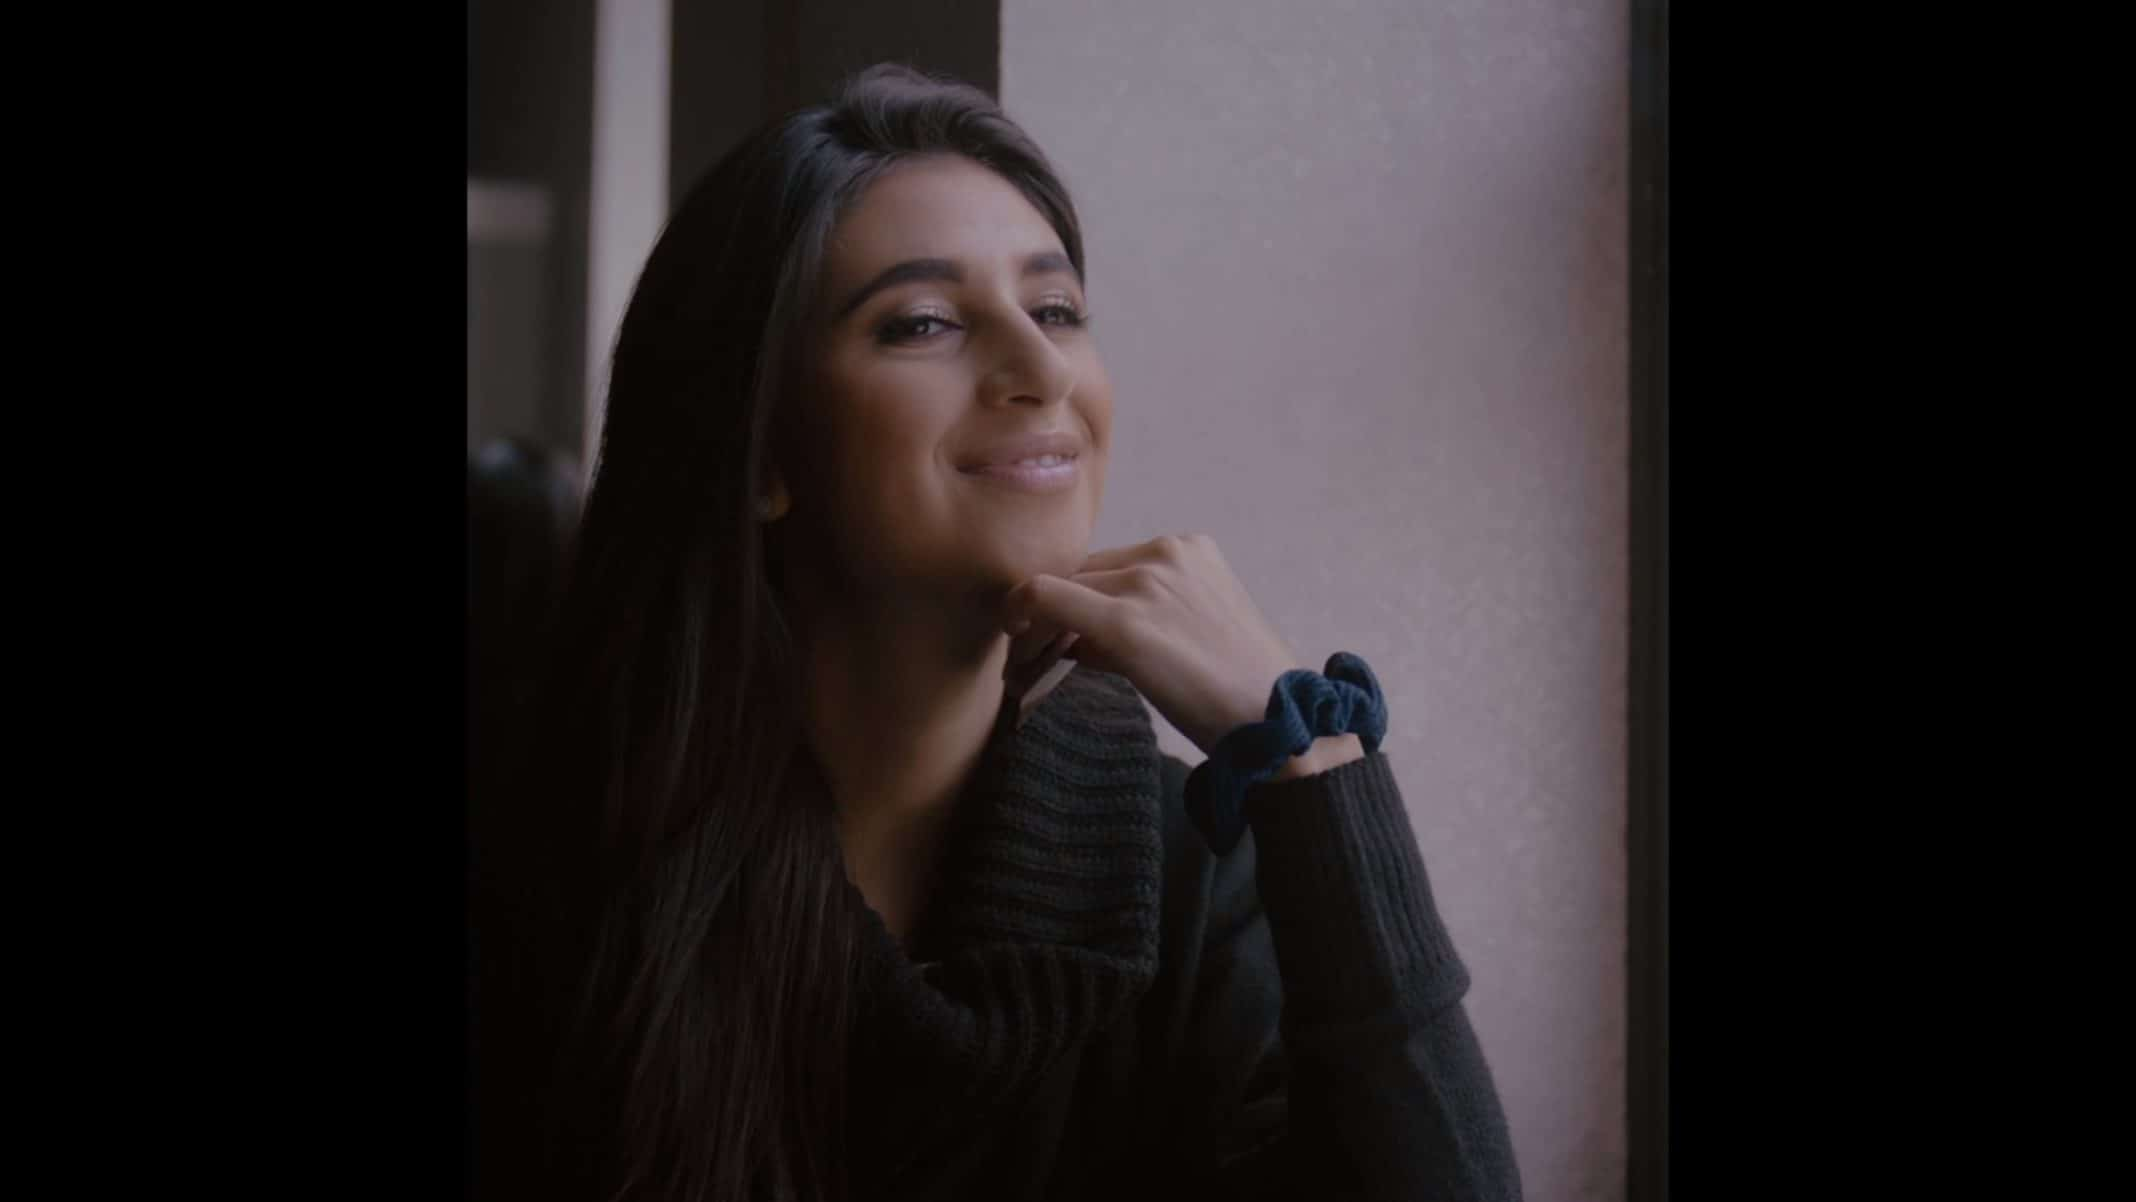 Elaina (Shlomit Azoulay) after smoking her vape pen.